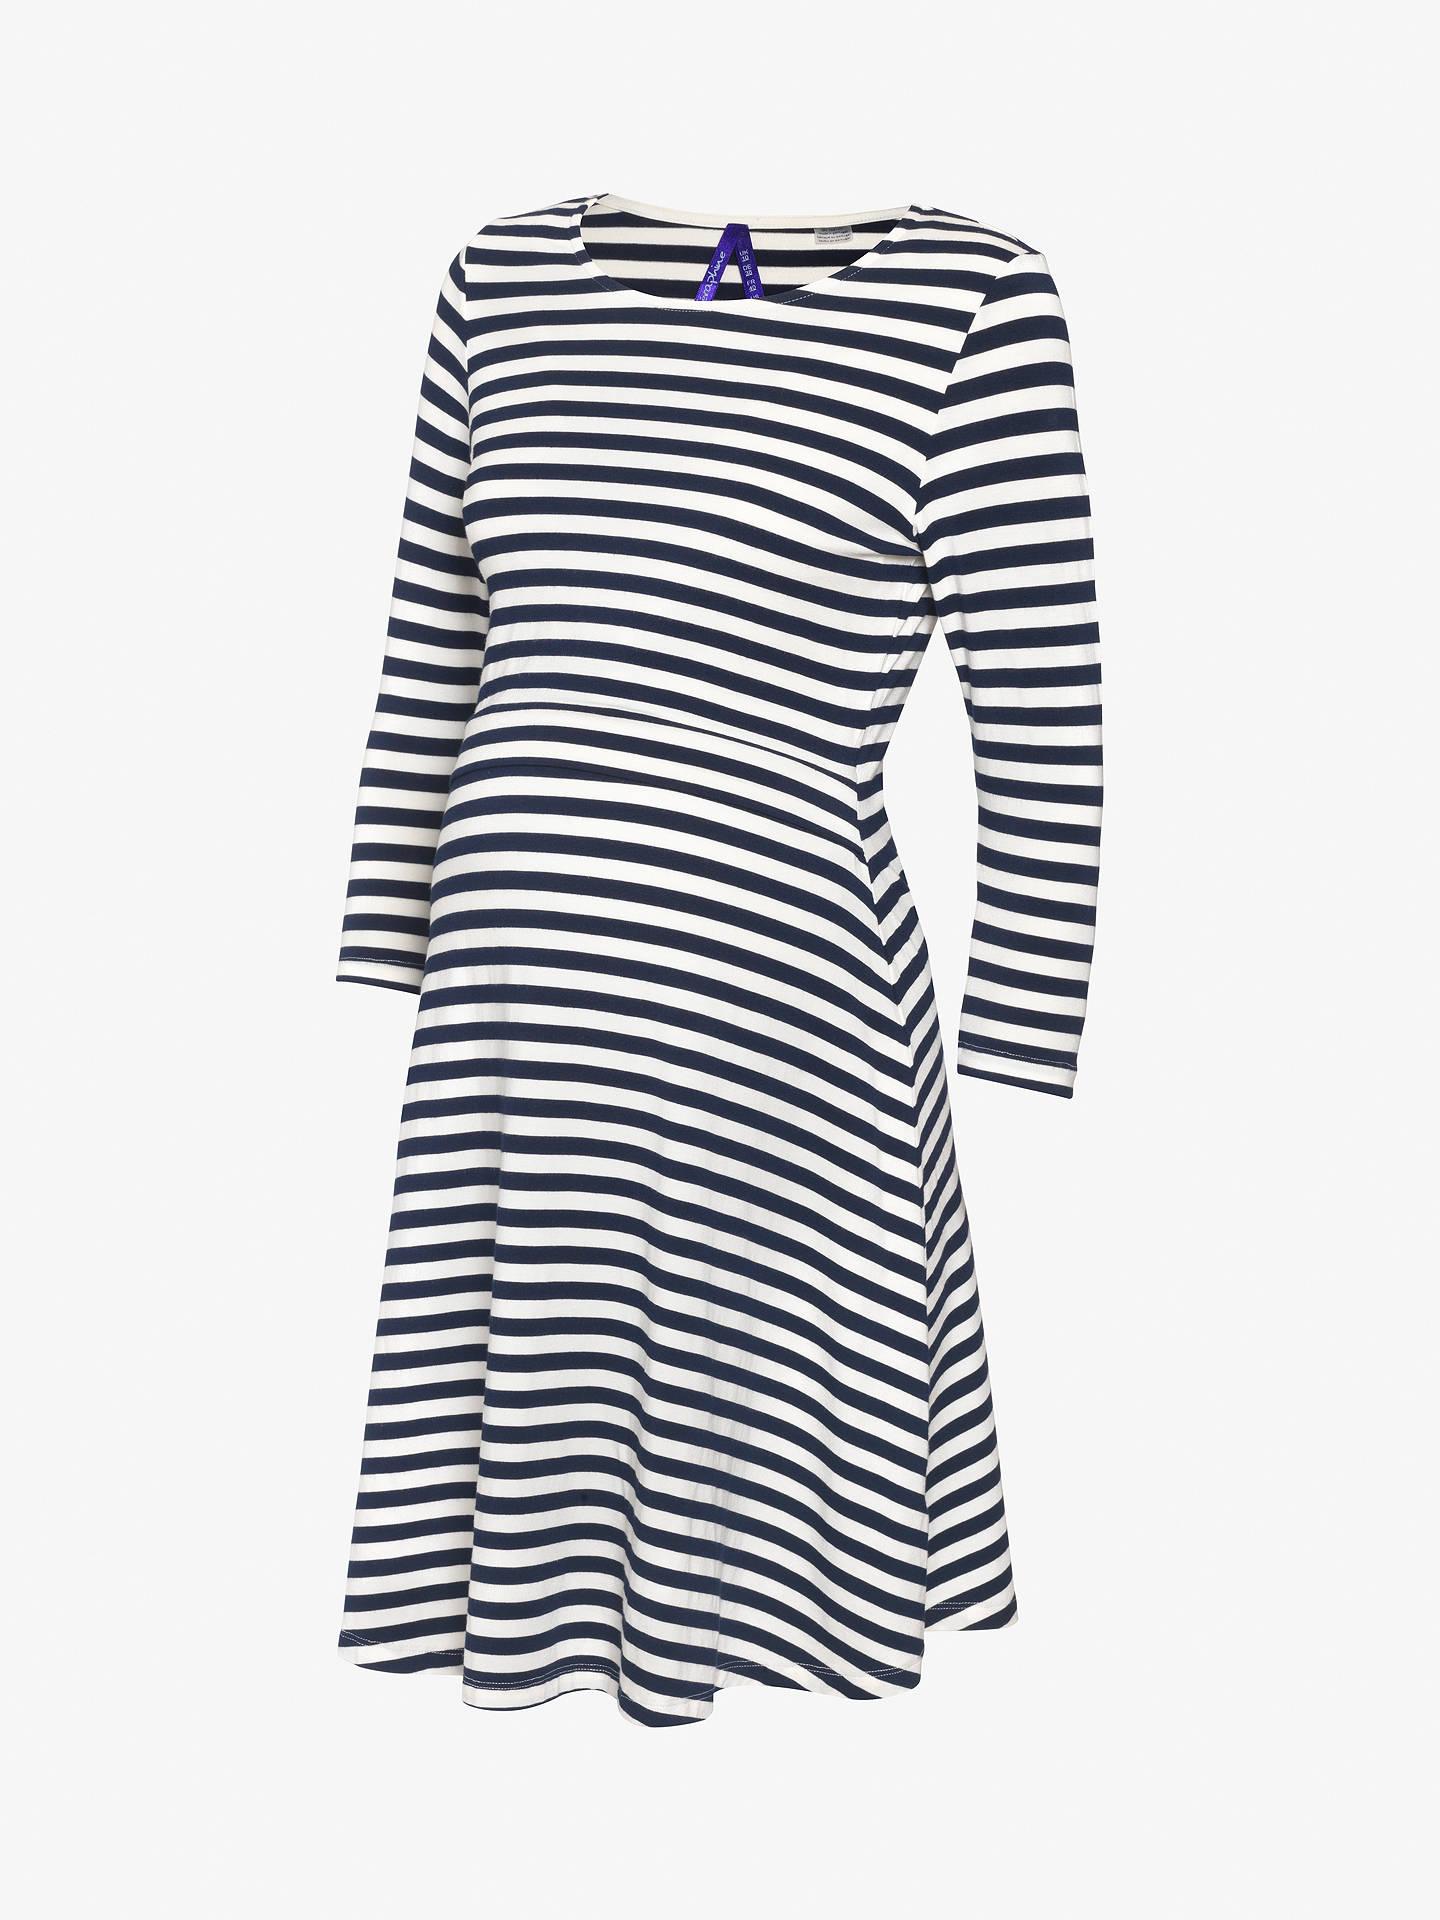 05957105f8e48 ... Buy Séraphine Nadia Nautical Stripe Nursing Maternity Dress, Navy/White,  8 Online at